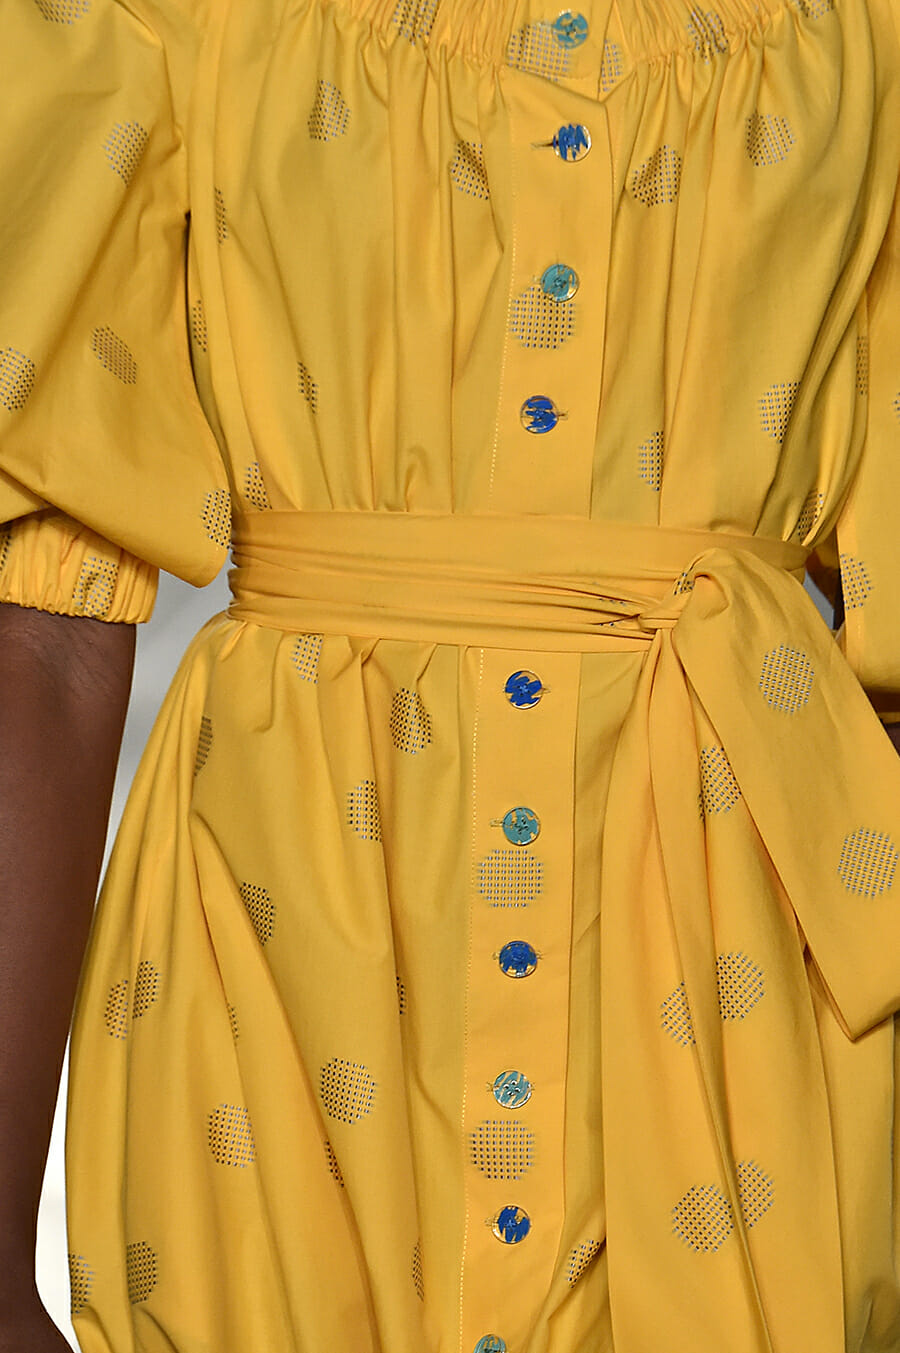 Carolina-Herrera-New-York-Fashion-Week-Spring-Summer-2018-NY-September-2017-look6-detail2